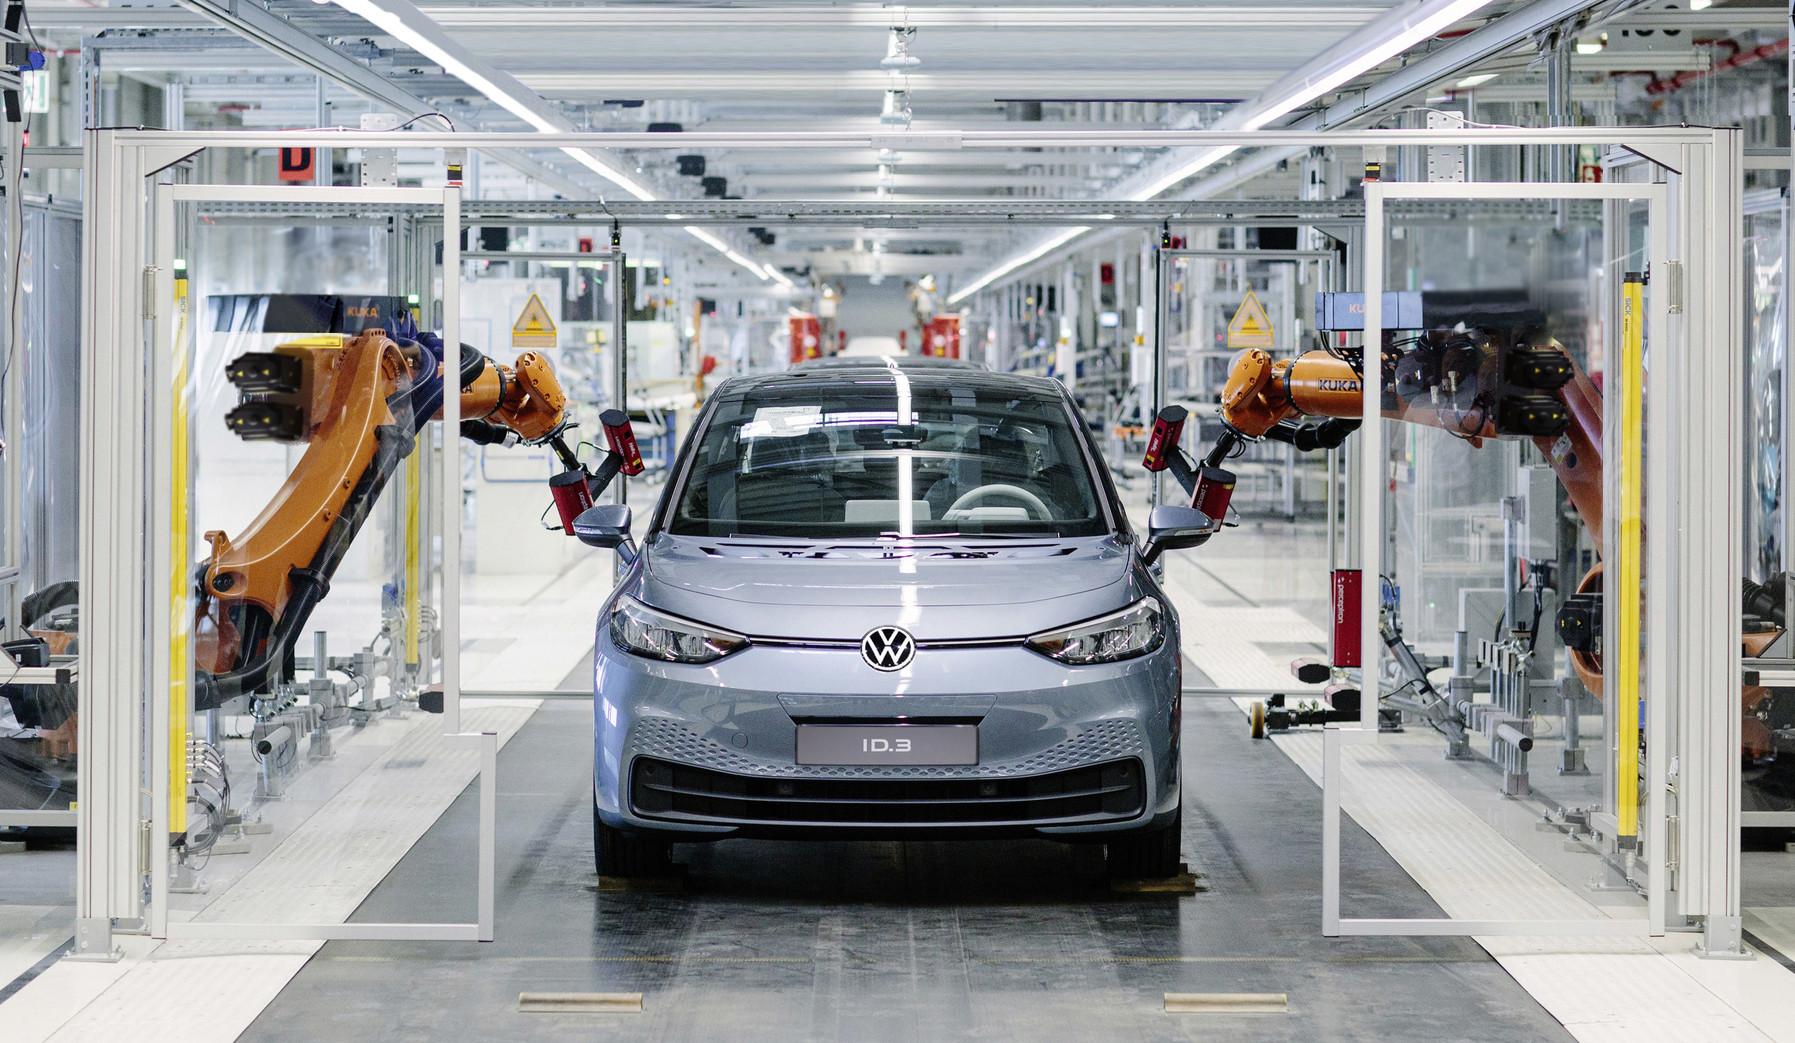 Volkswagen 加速佈局純電未來,靠 ID. 家族創造碳中和製程